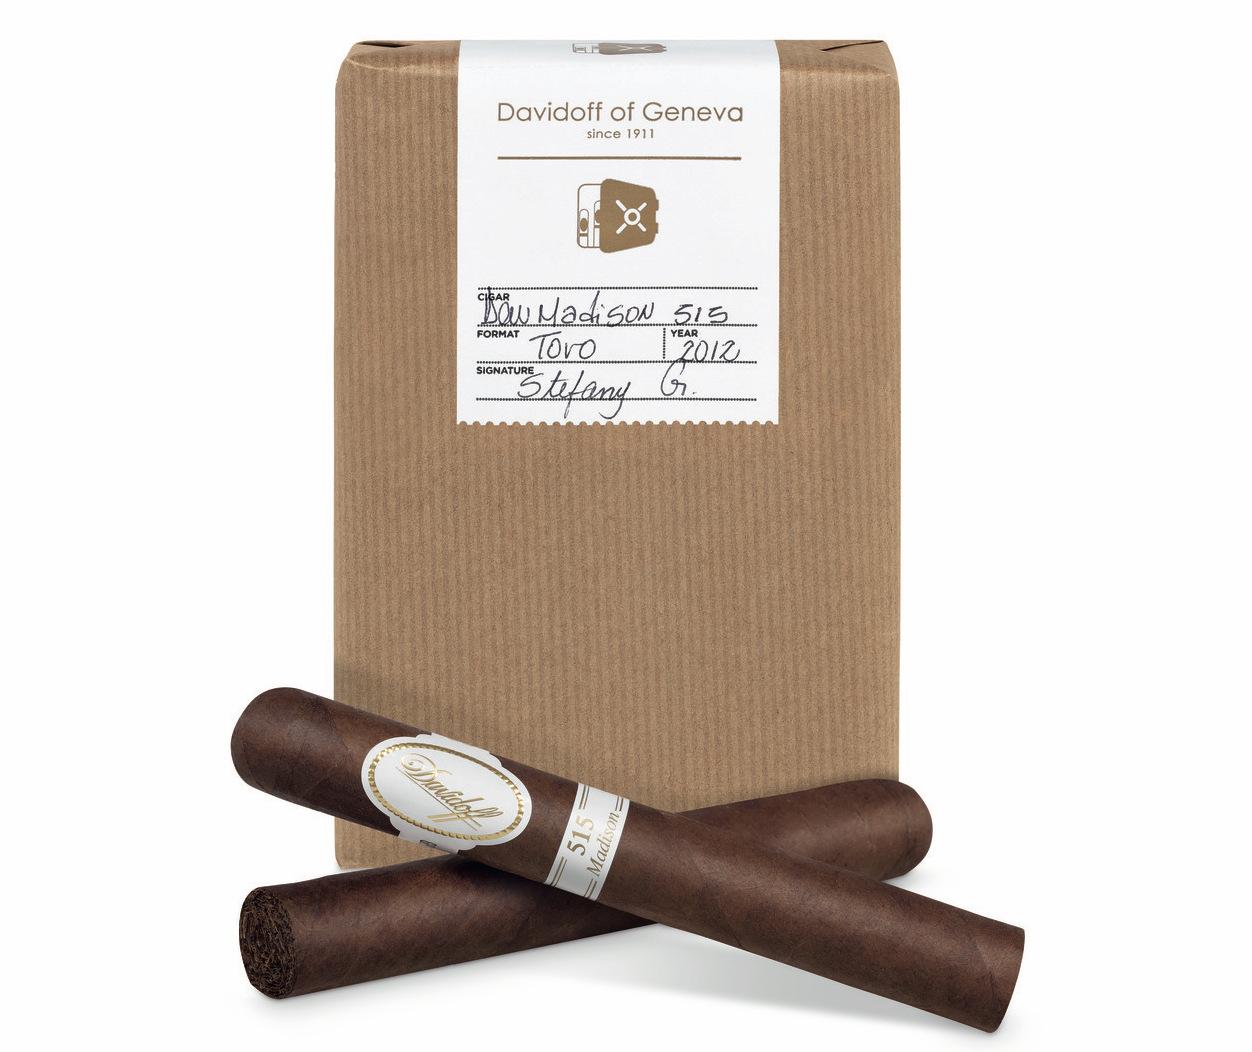 Cigar News: Davidoff Madison 515 Toro to be Next Vault Series Release